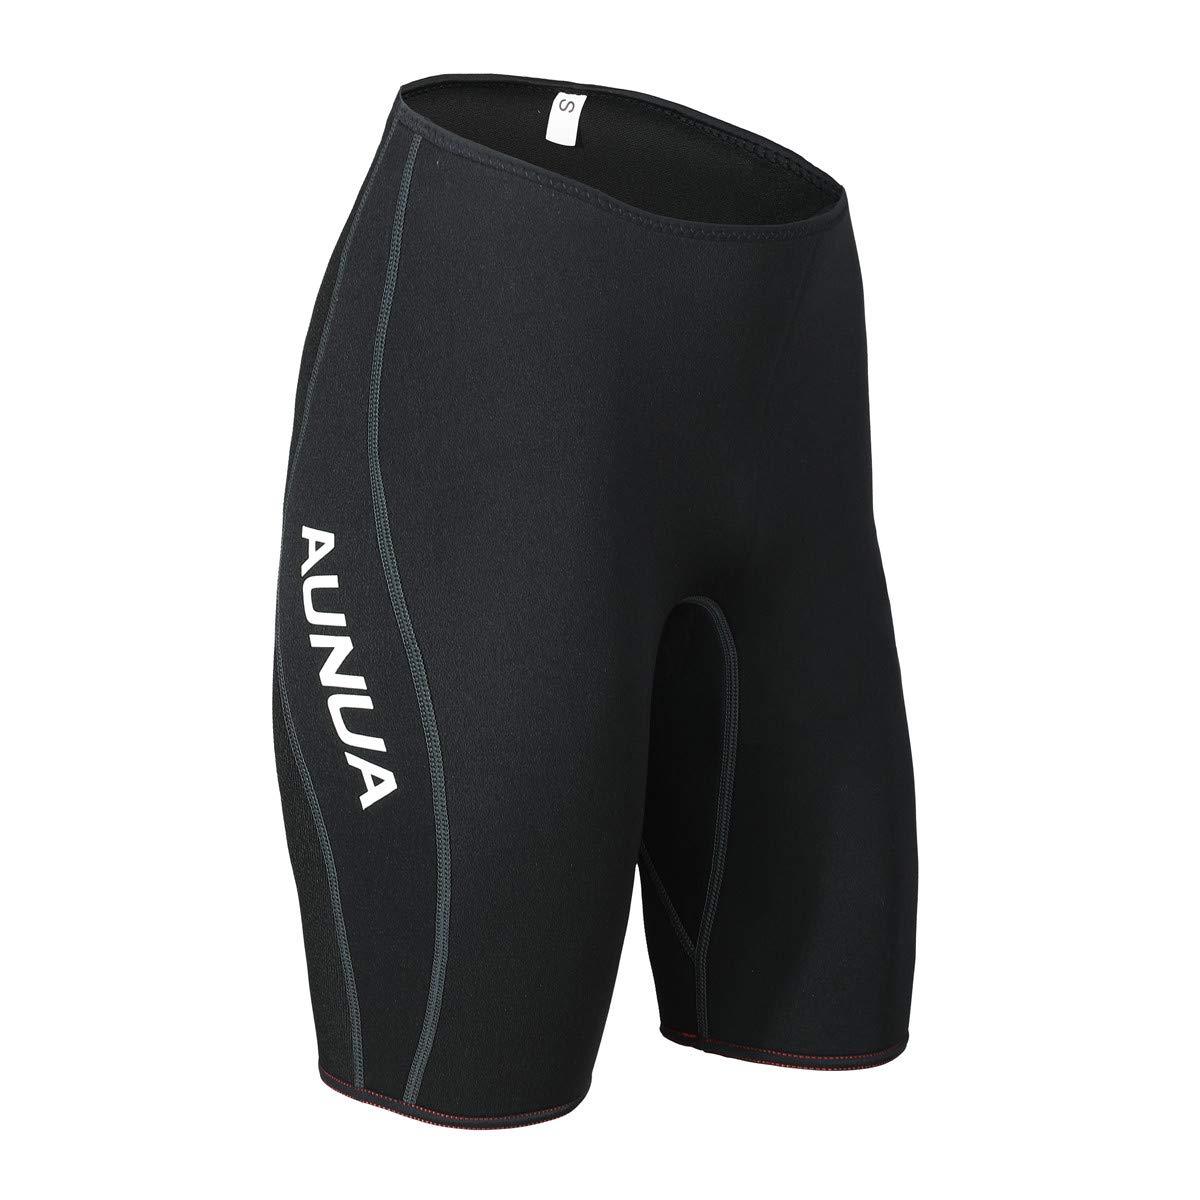 Aunua プレミアム 3mm ネオプレン ウェットスーツ ショートパンツ カヌー 水泳用ショーツ B07KP1HFGV  Medium